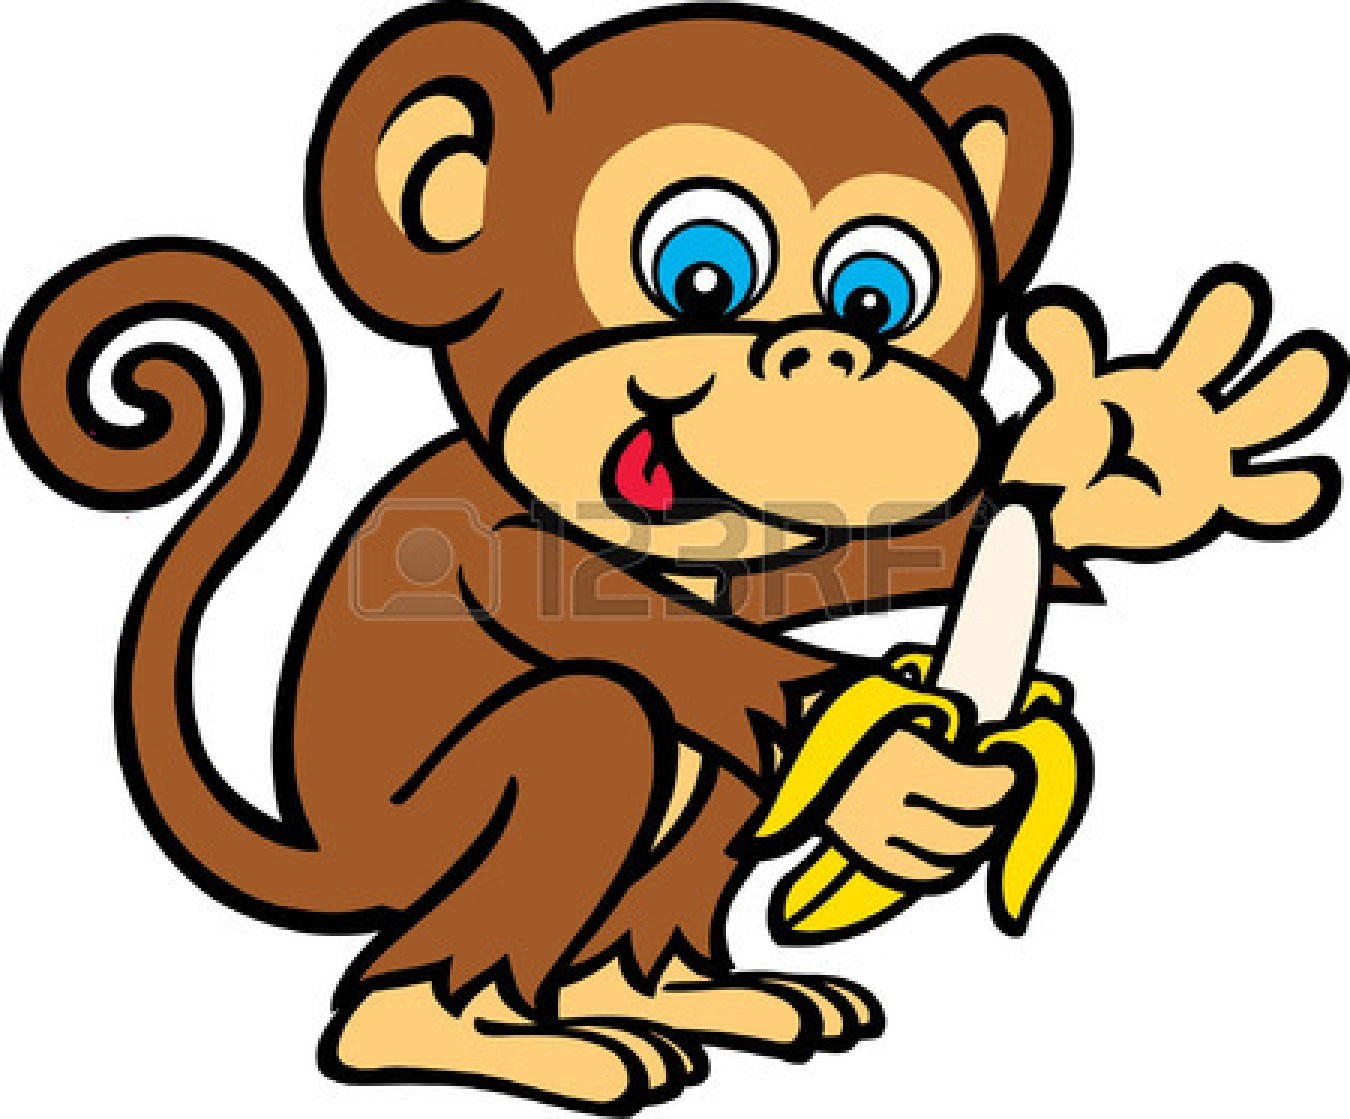 Monkey banana clipart 5 » Clipart Portal.